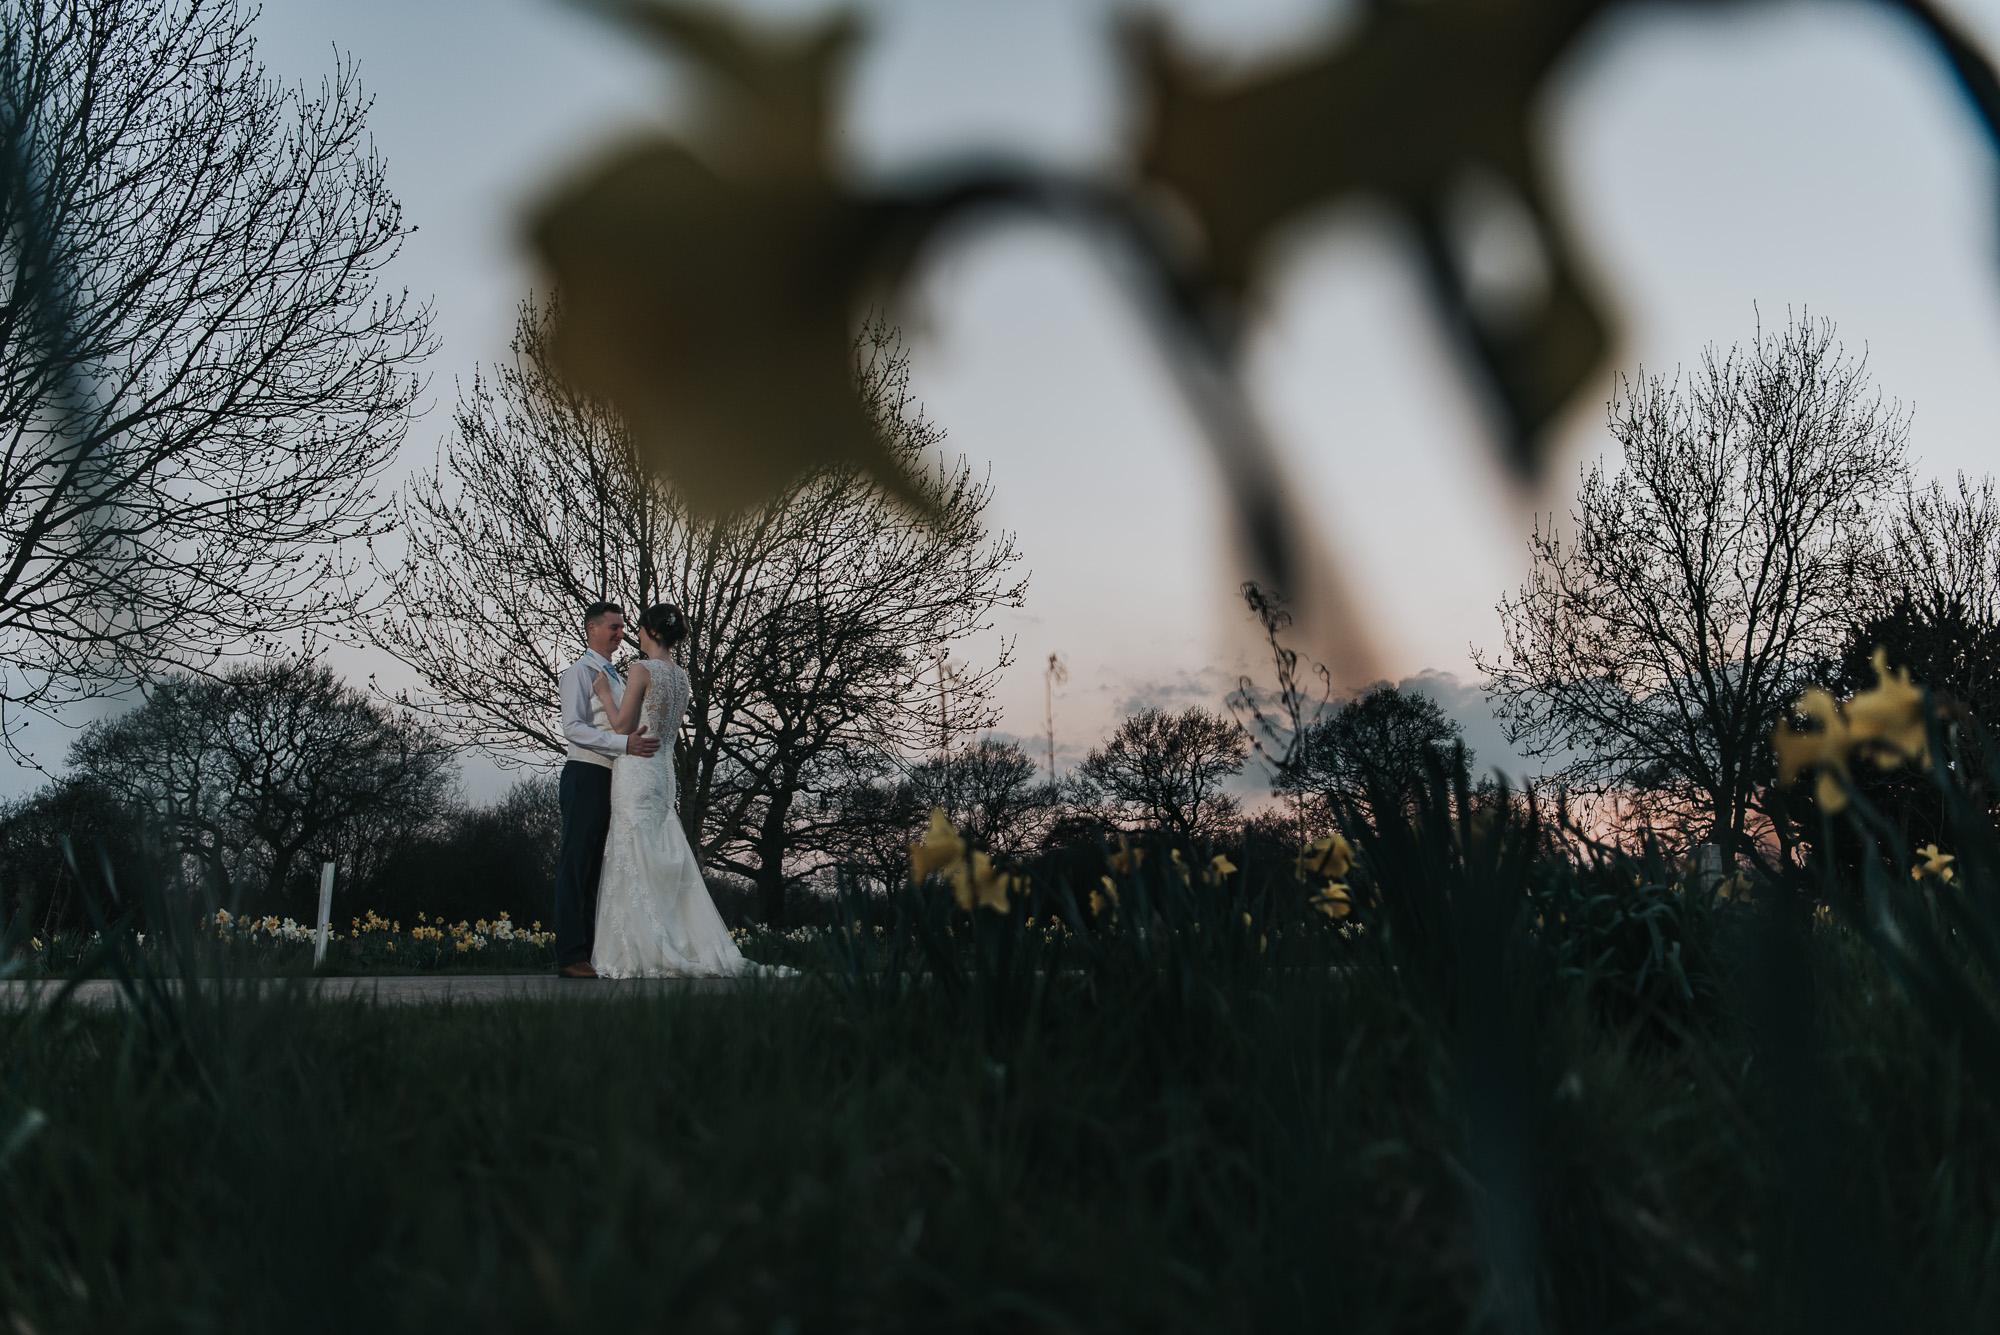 Beeston Manor Wedding Photographer based in cheshire covering Lancashire weddings and surounding areas of the northwest uk (3 of 6).jpg